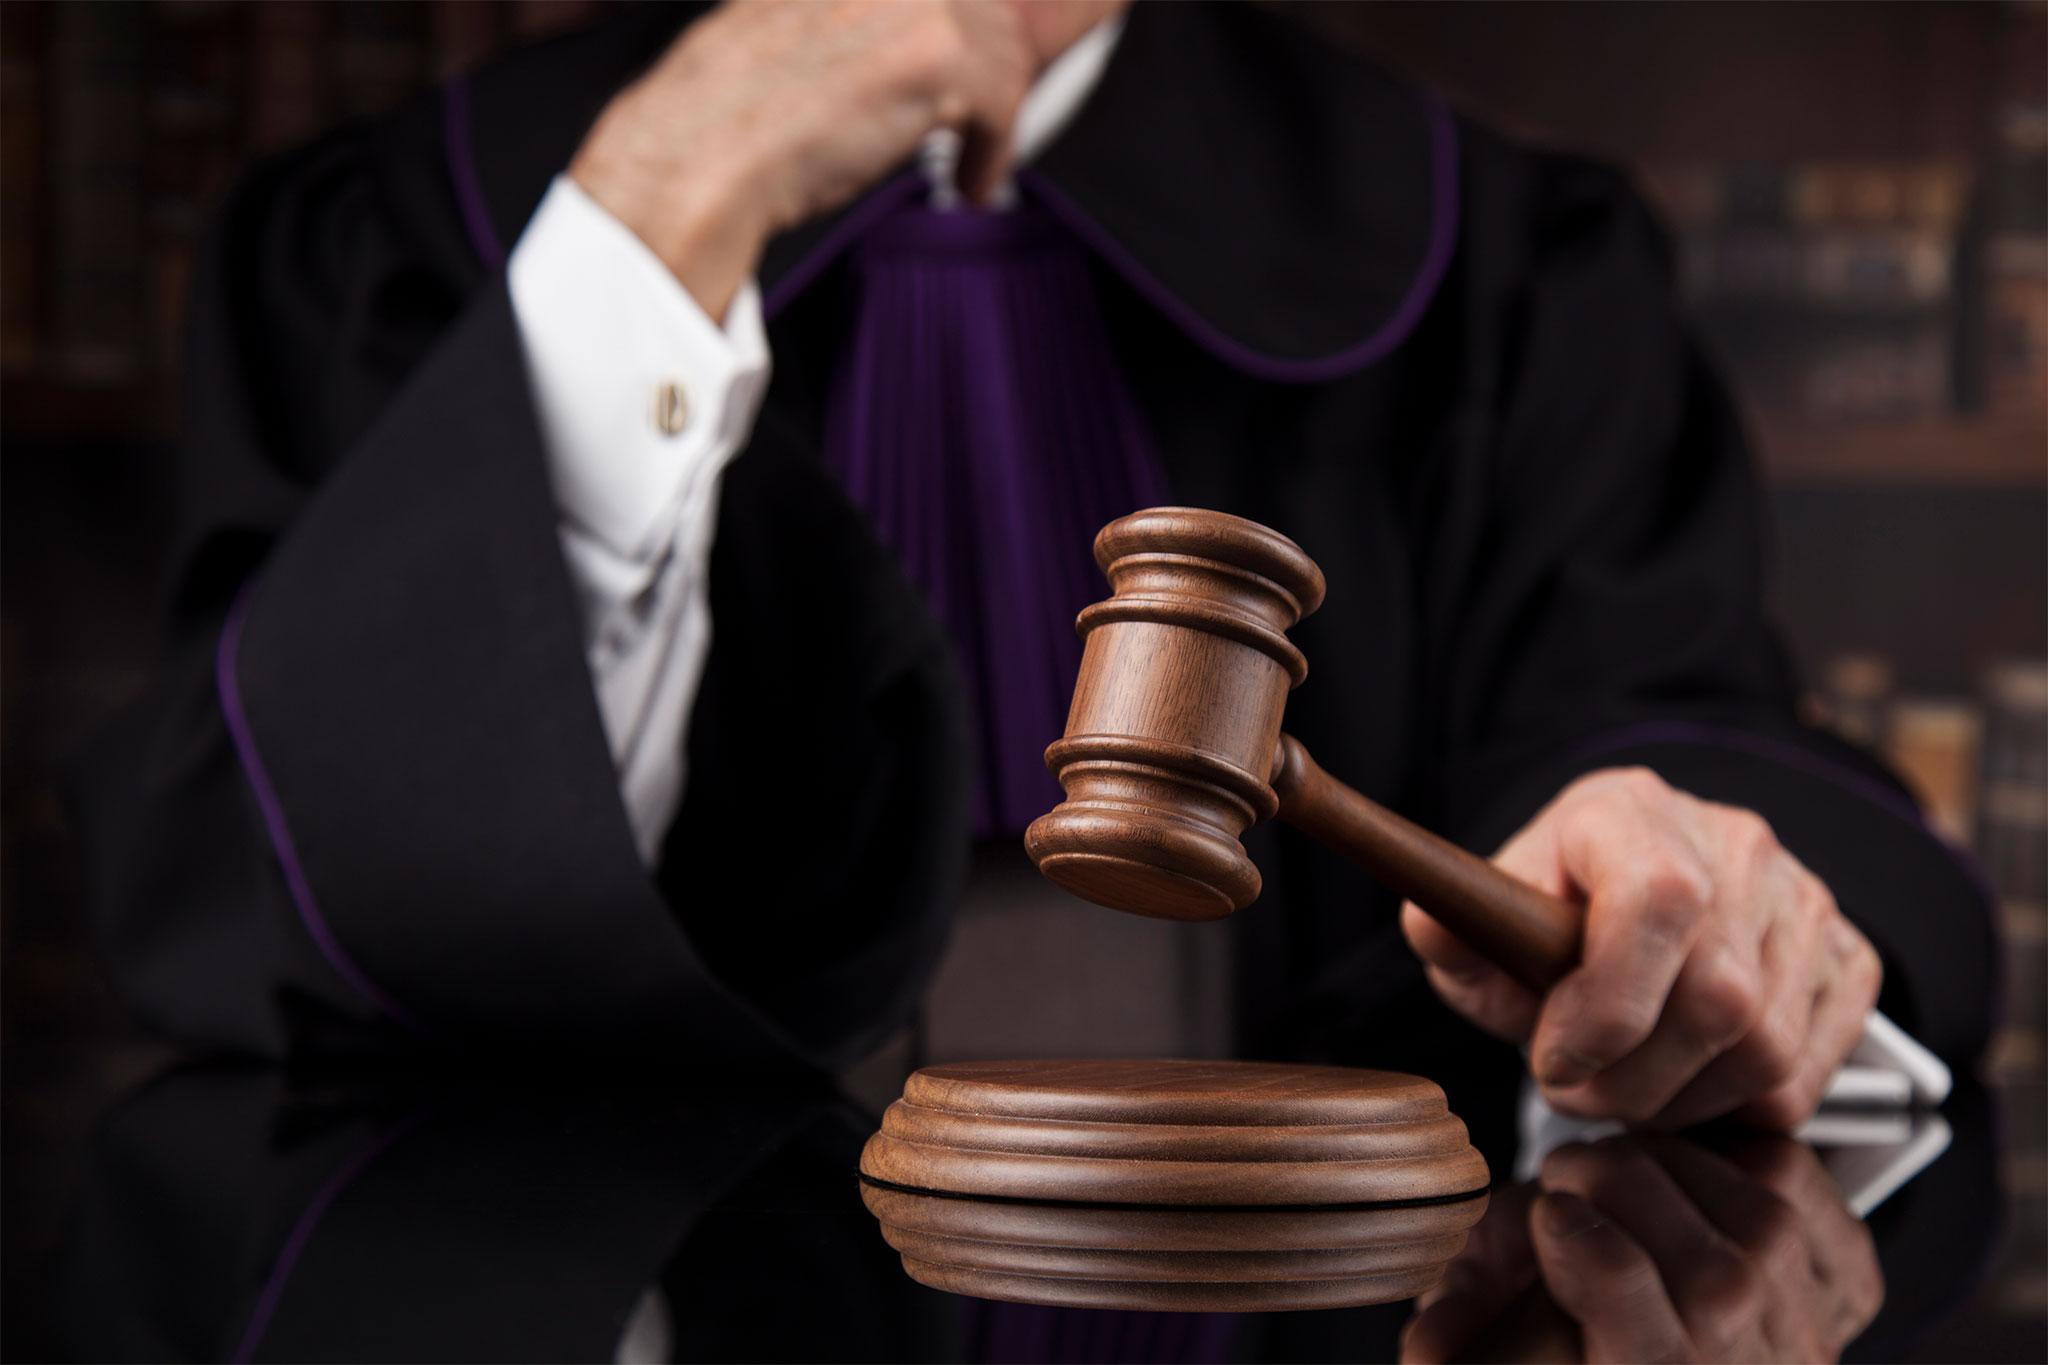 Judge hitting a gavel